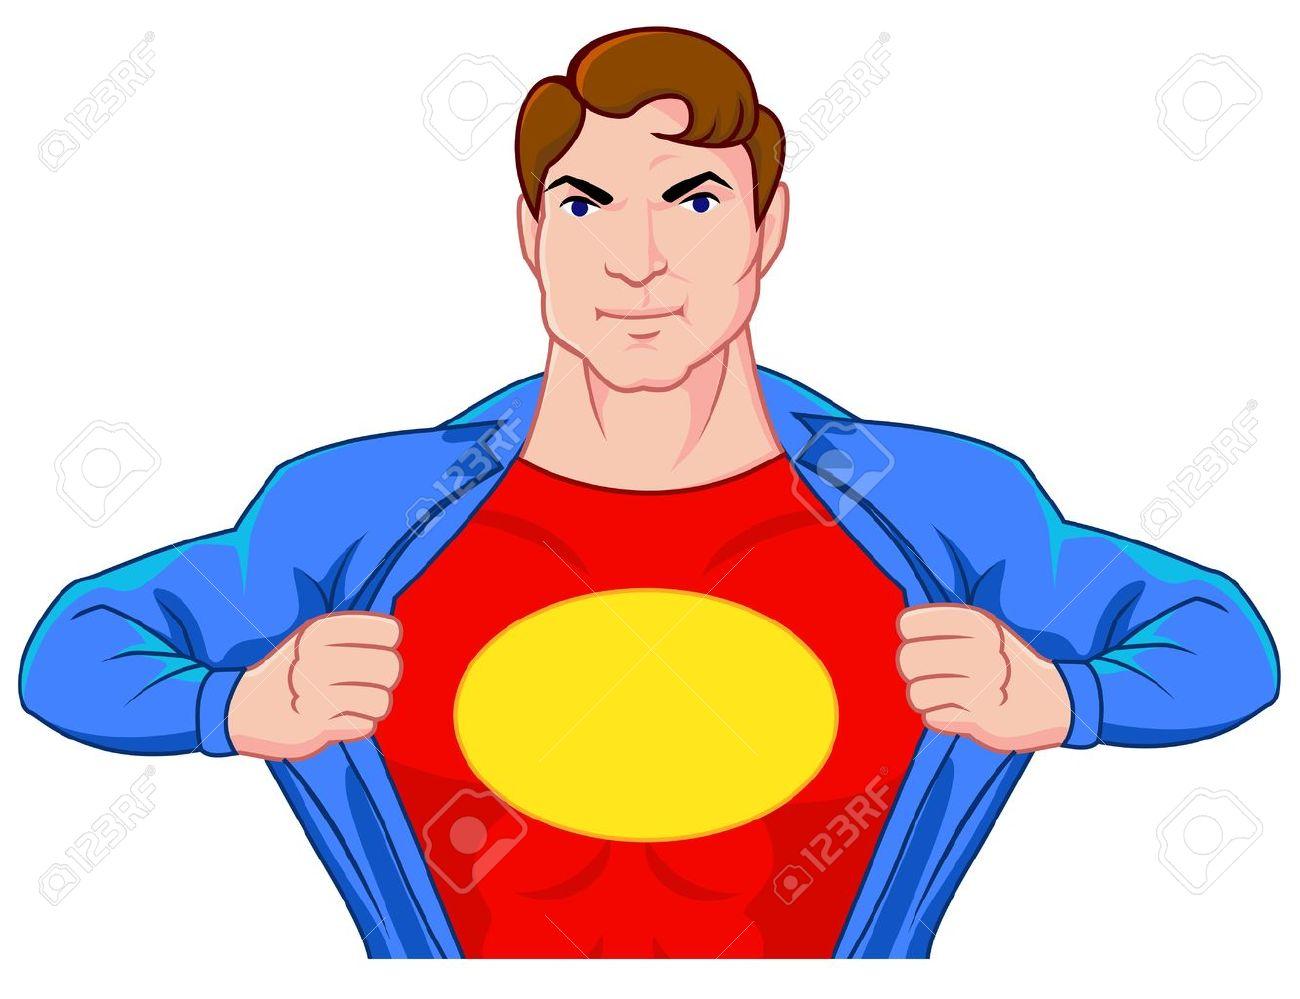 Superhero undercover Superhero